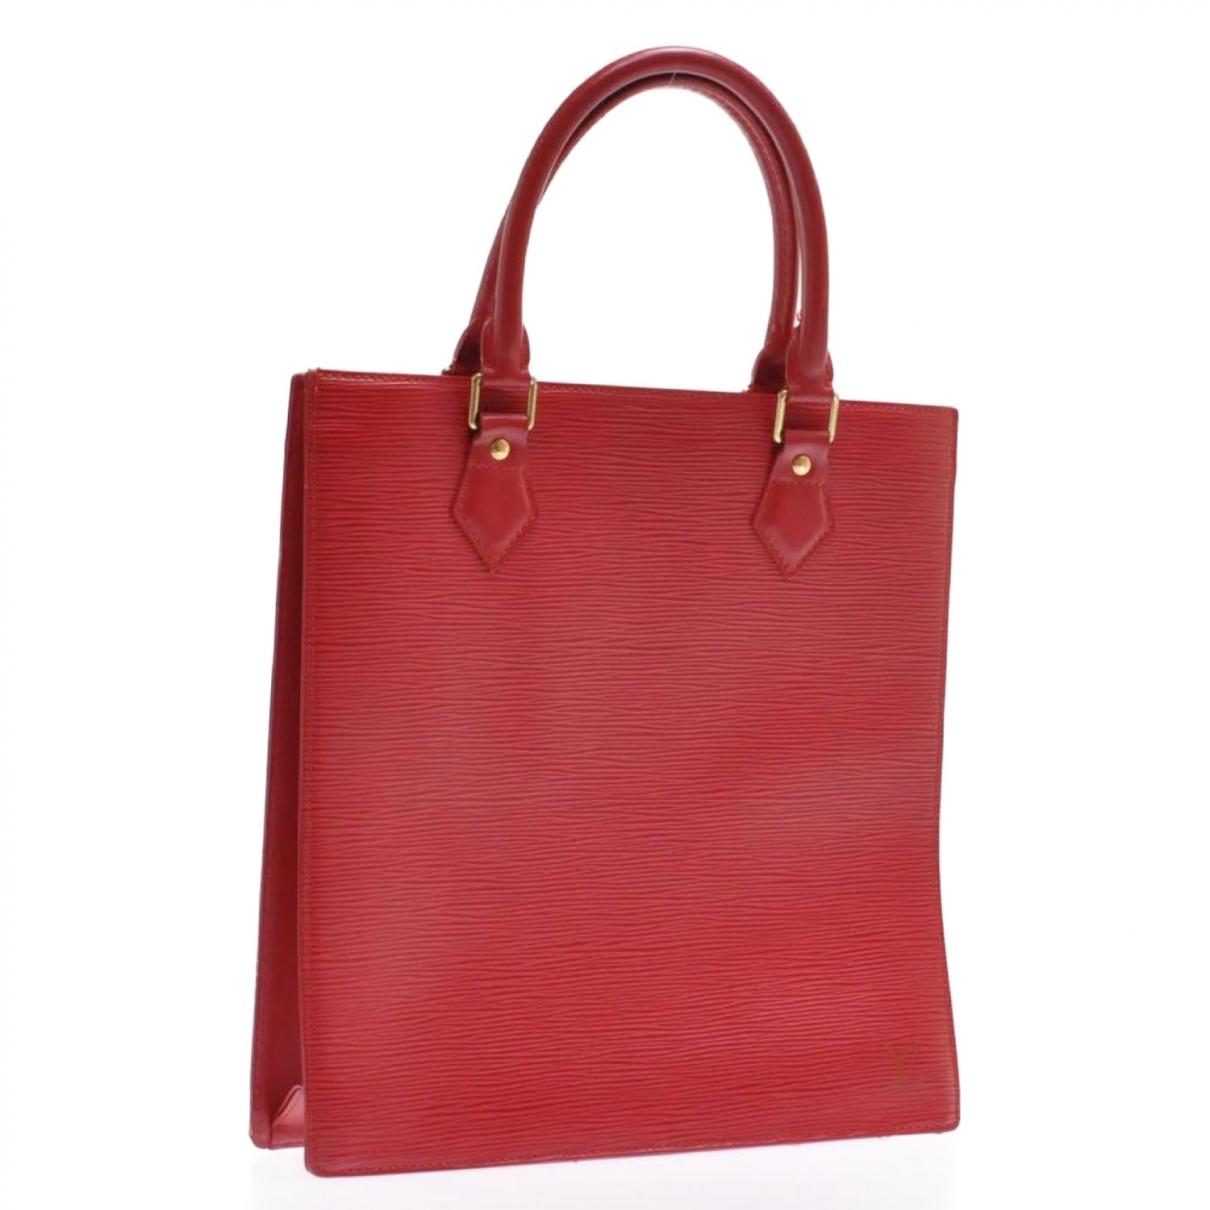 Bolso Plat de Cuero Louis Vuitton